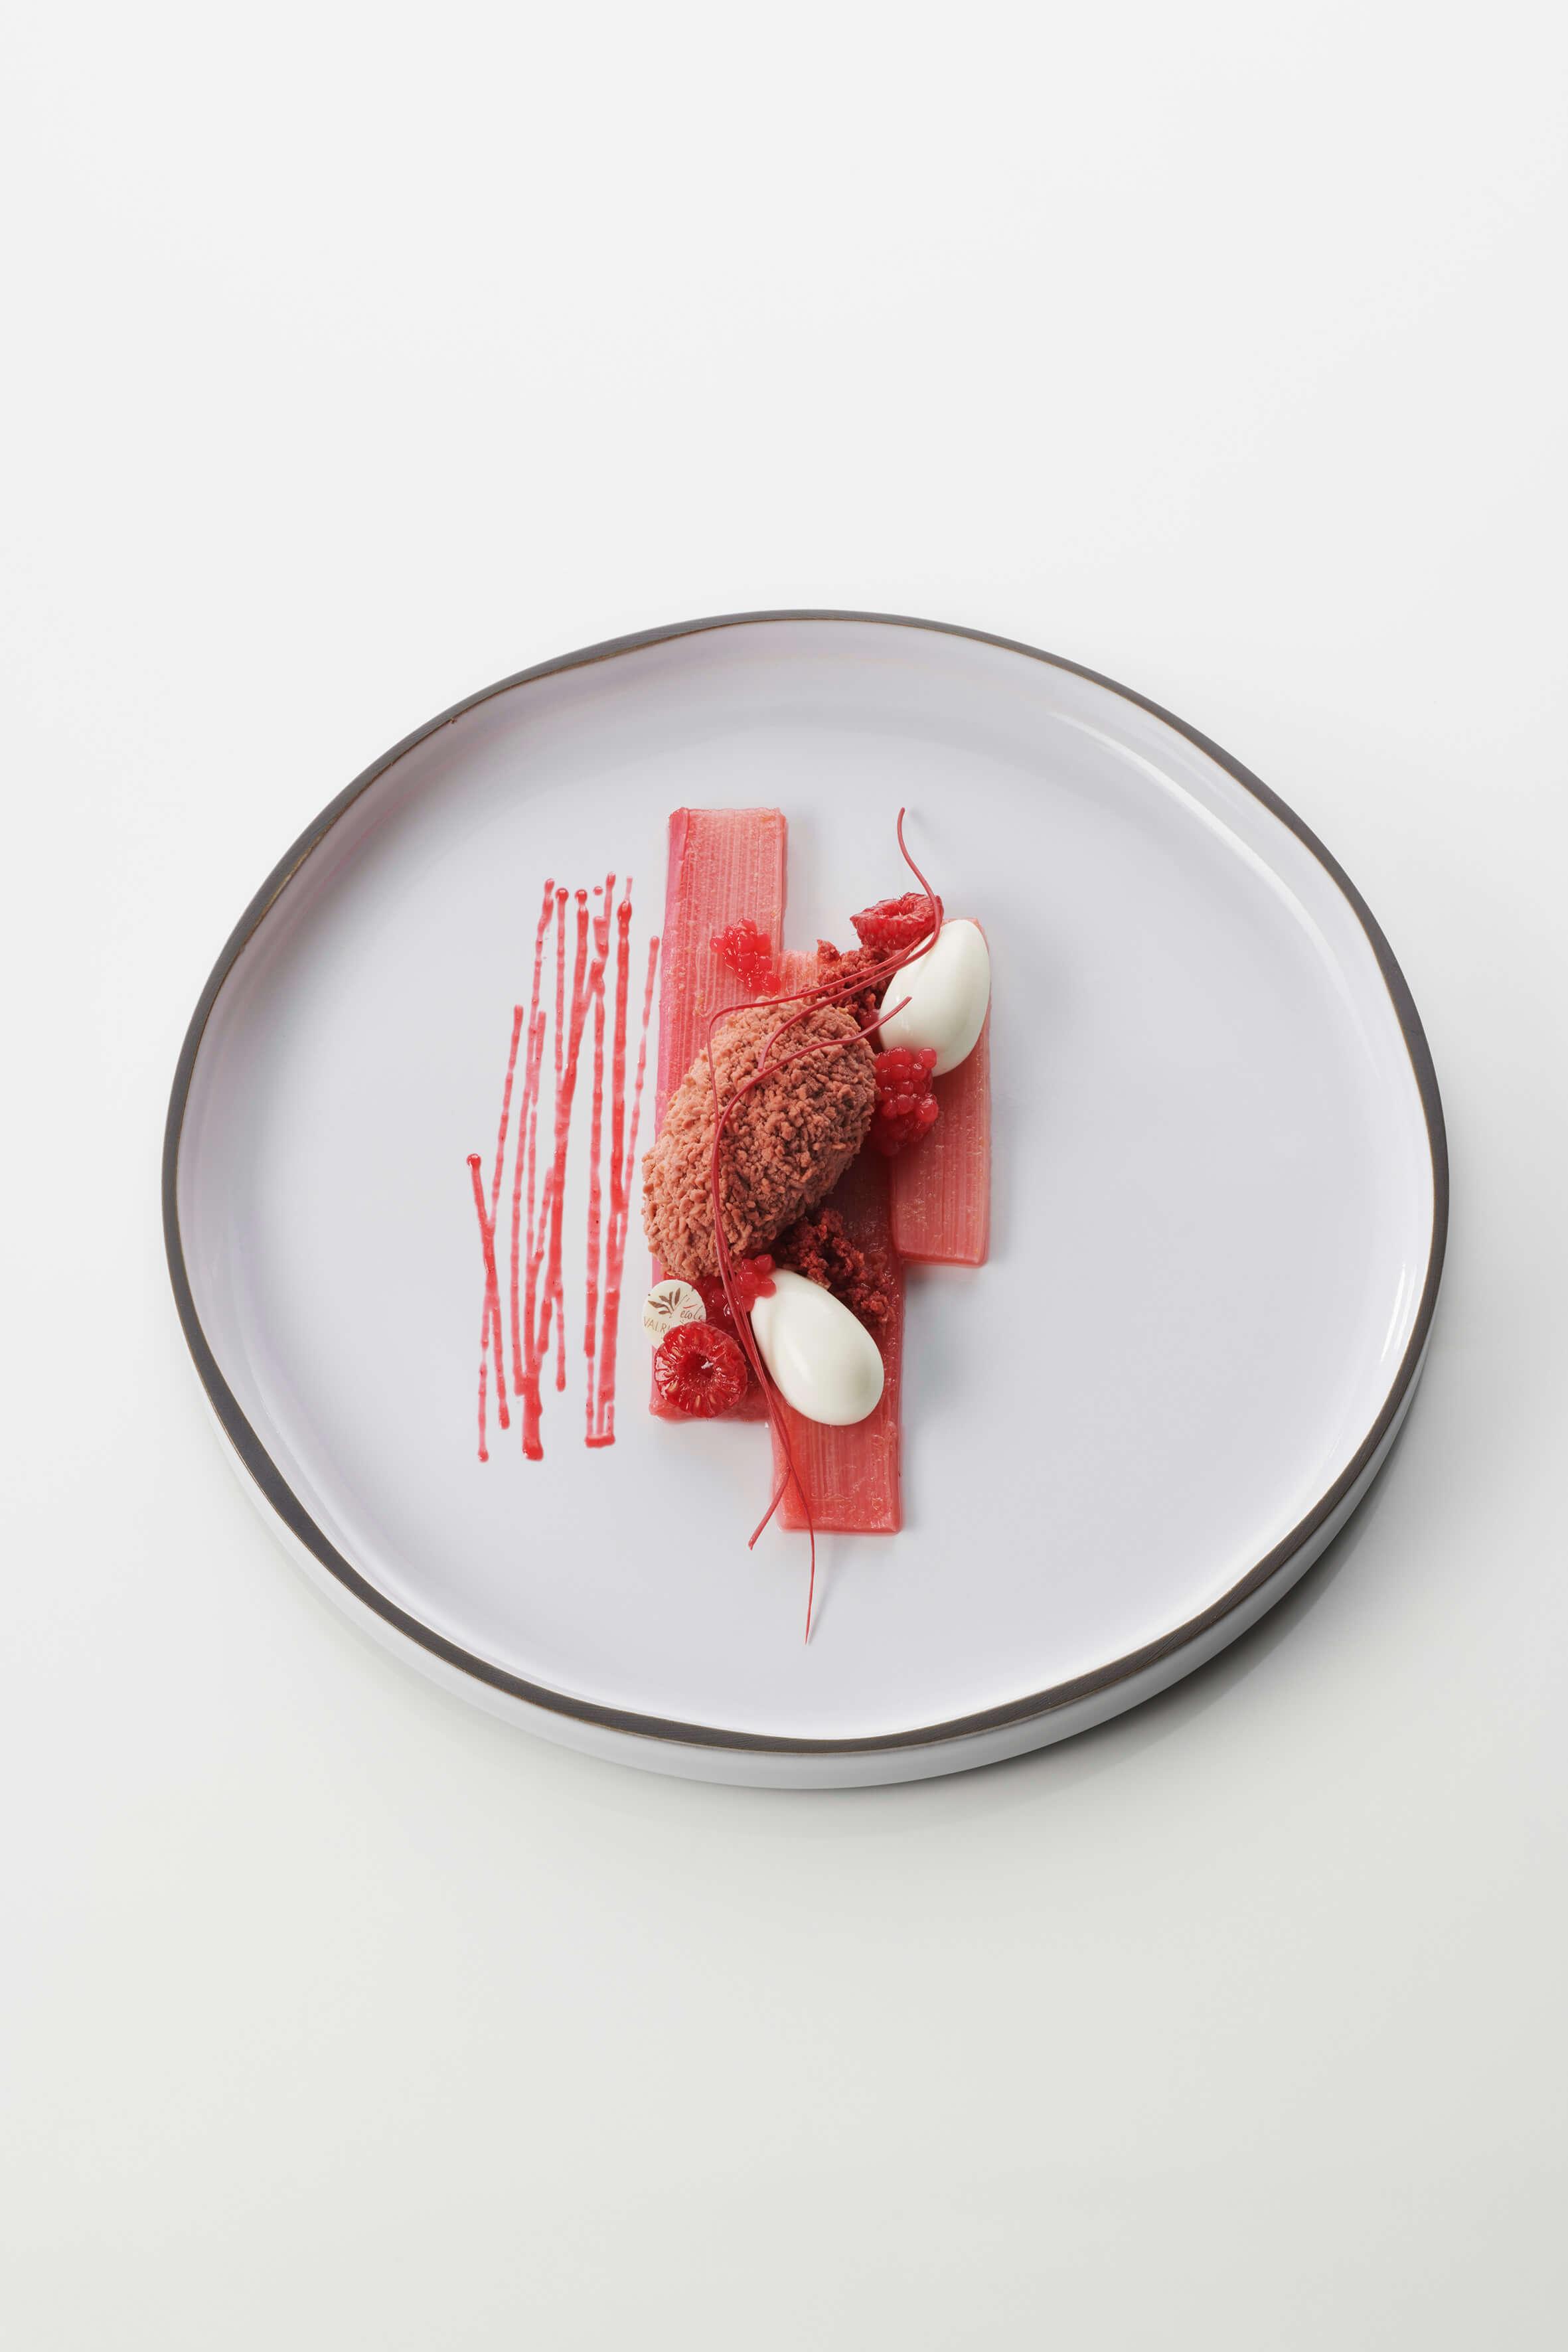 Pink Rhubarb Plated Dessert Recipe